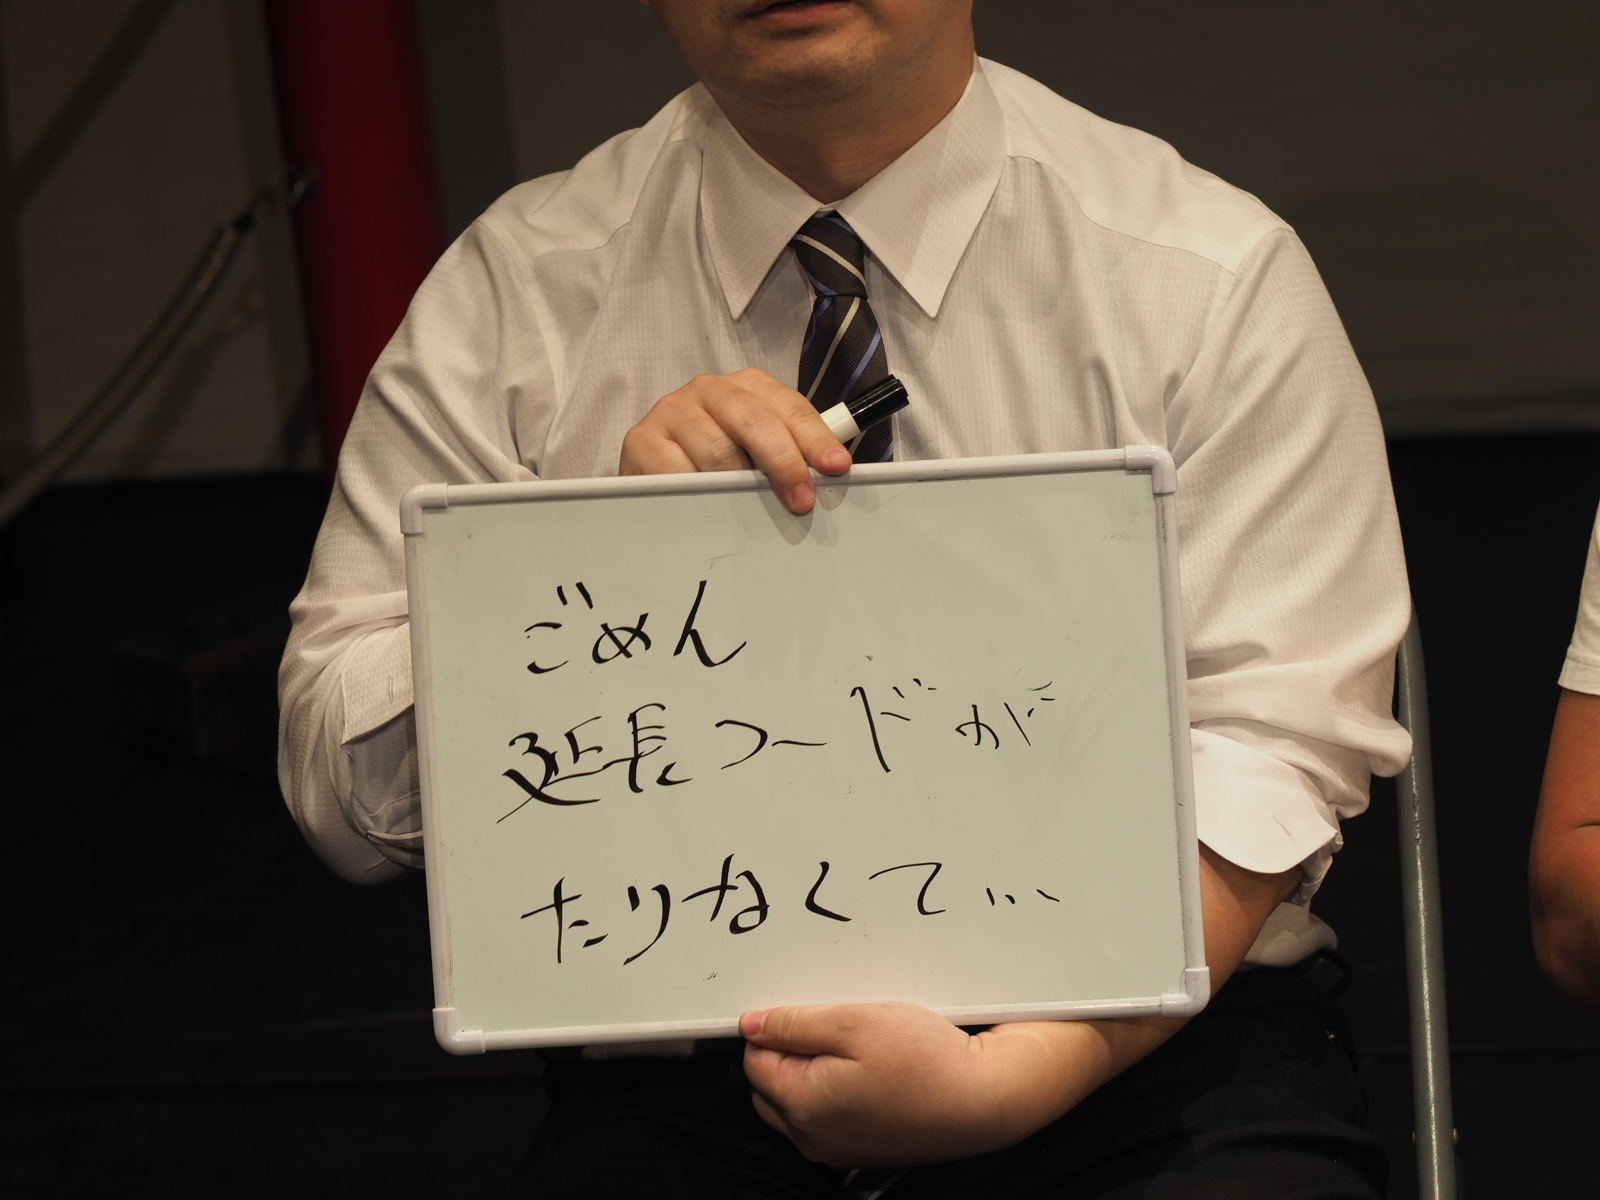 f:id:motomachi24:20170507182857j:plain